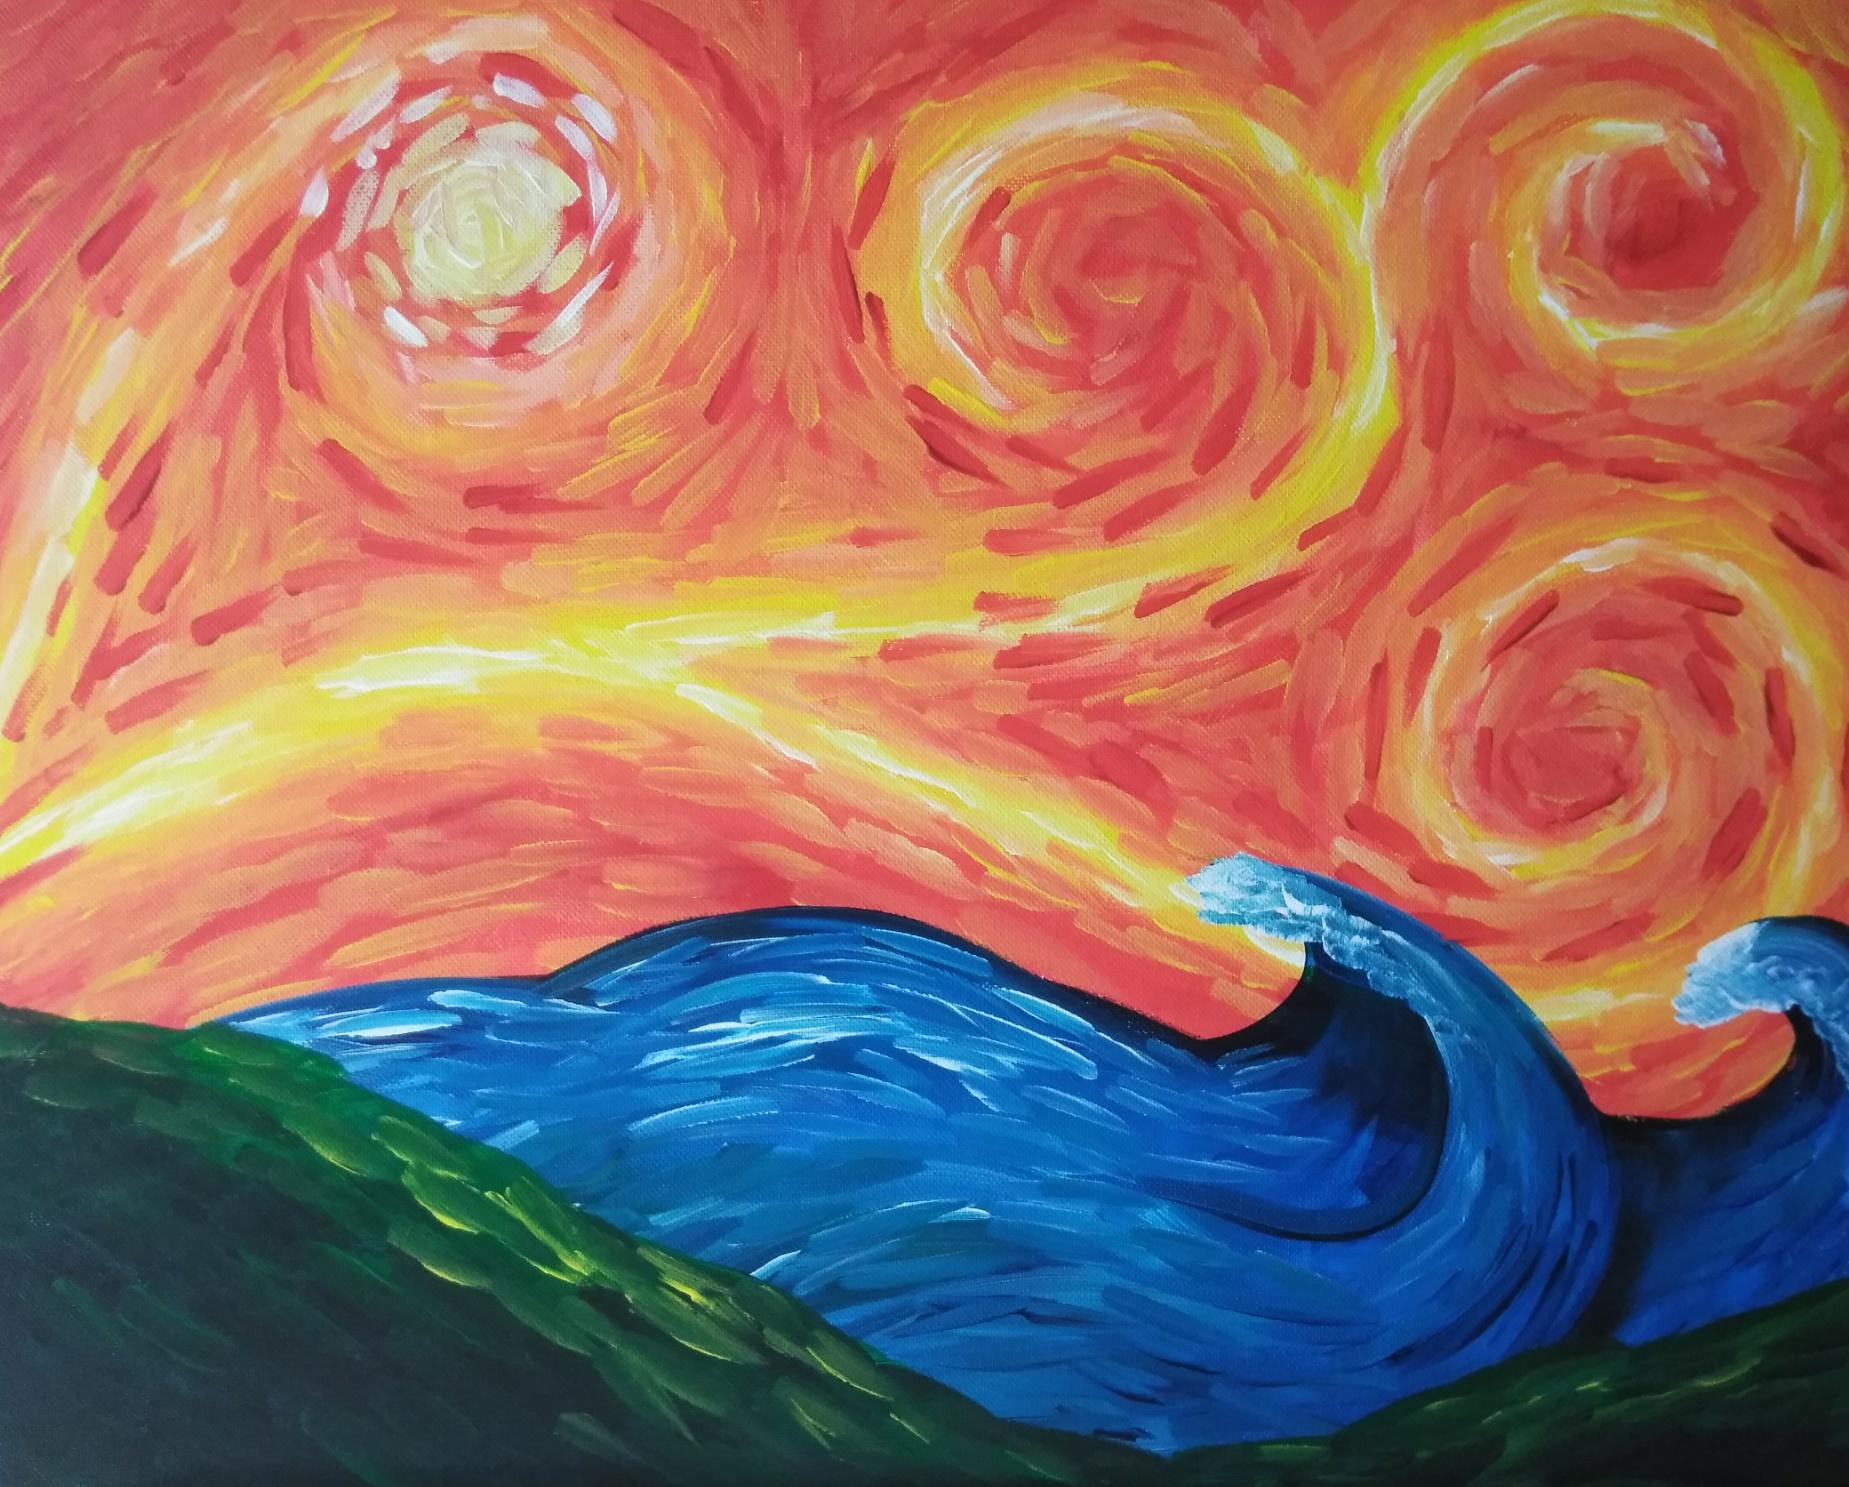 Swirly Sky and Sea